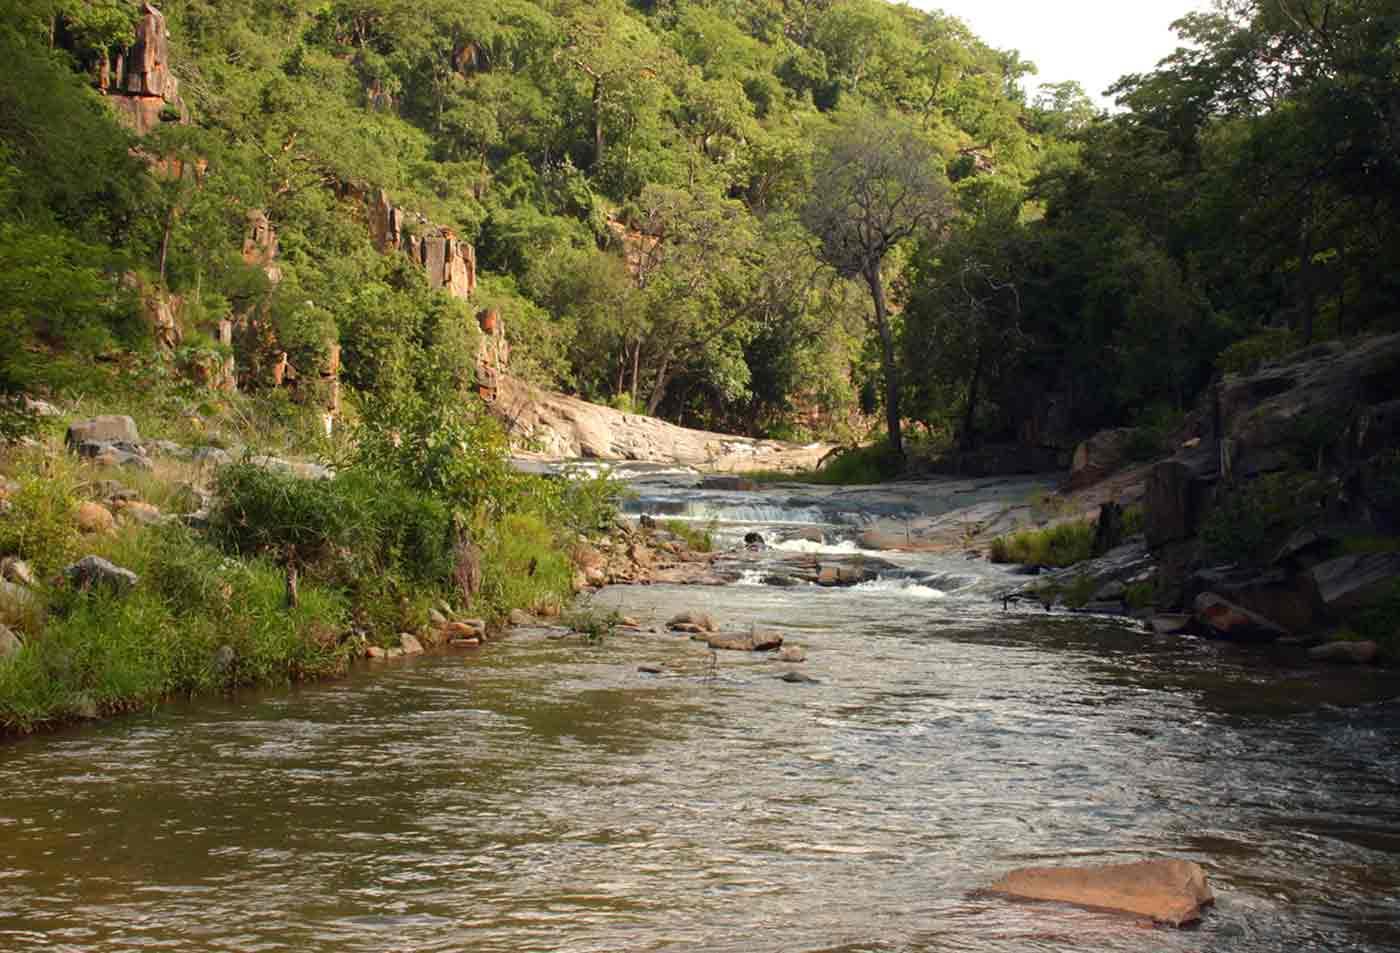 View up the Umvumvumvu River gorge from near the old (broken) bridge